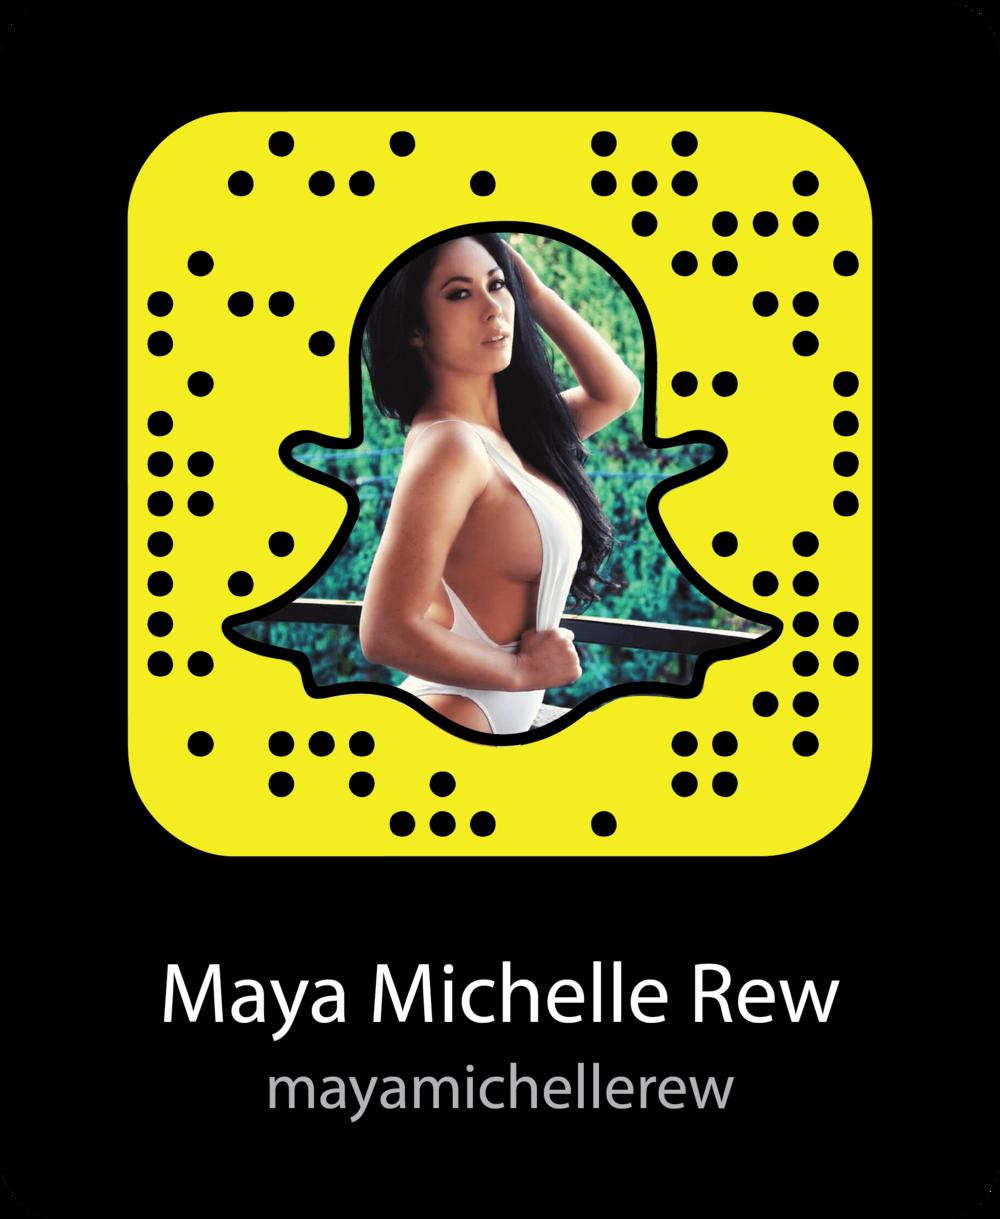 maya-michelle-rew-sexy-snapchat-snapcode